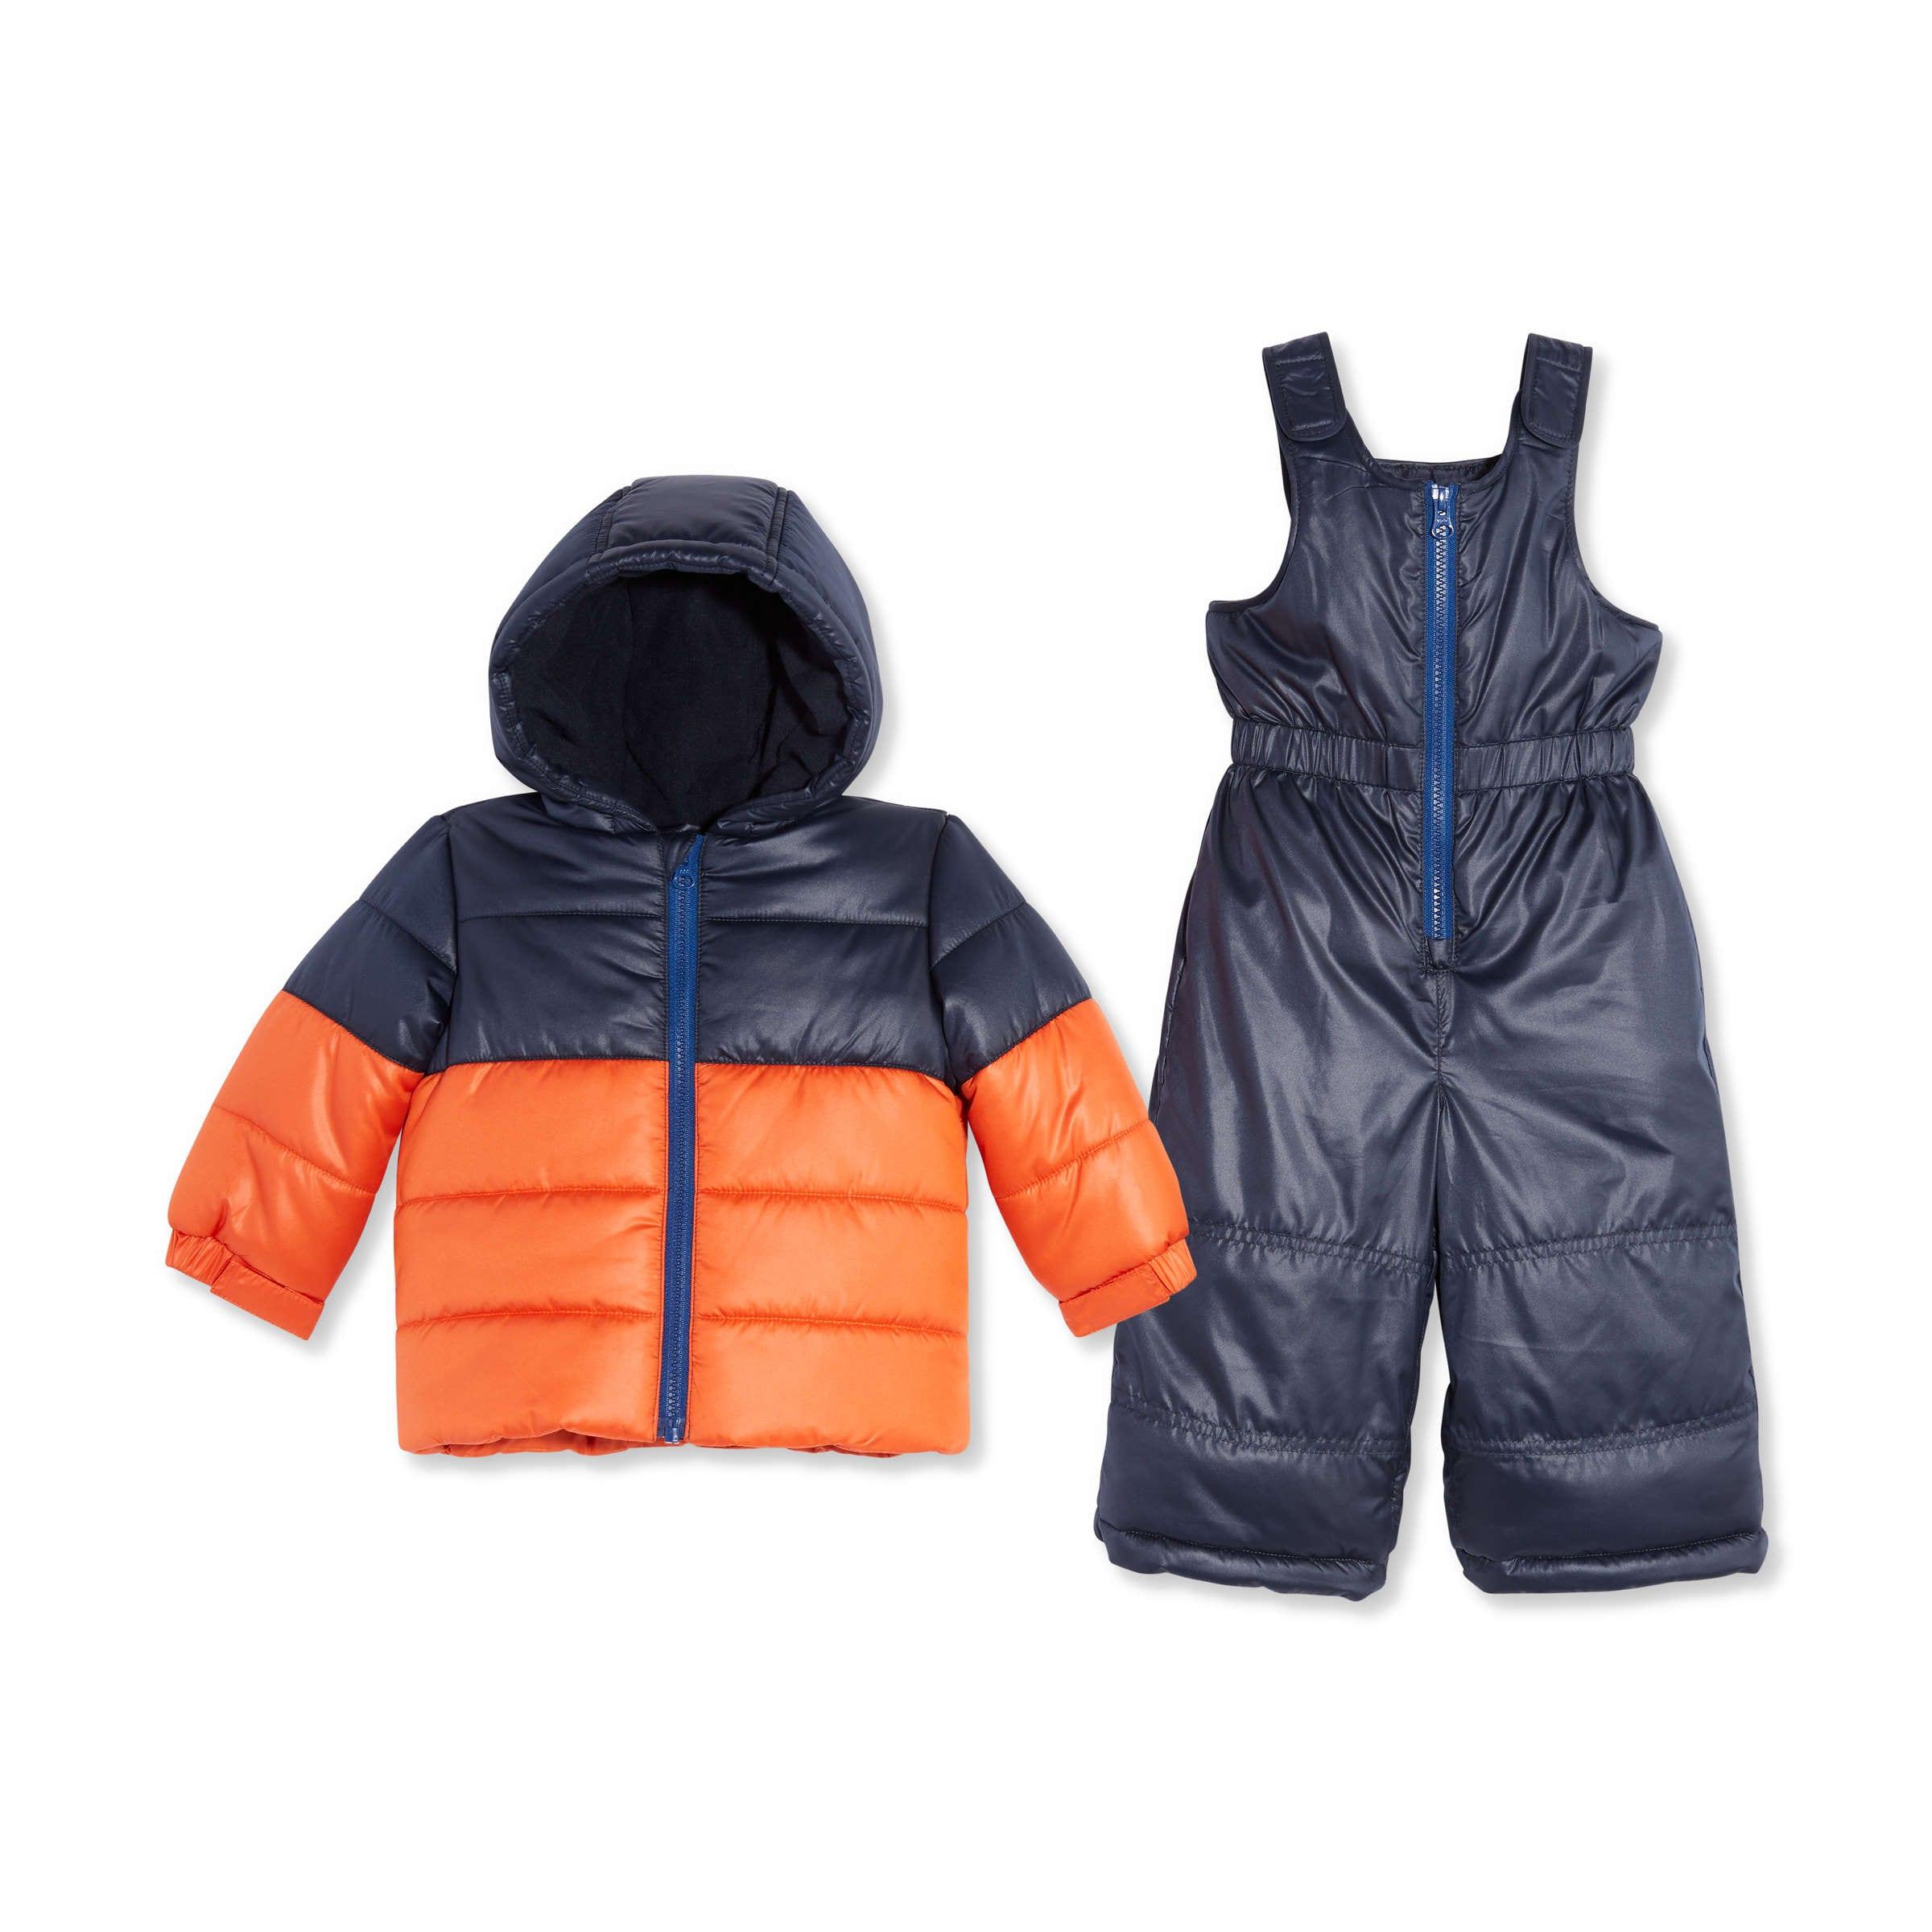 1ec07c234 Baby Boys  2 Piece Snowsuit Set in Orange from Joe Fresh